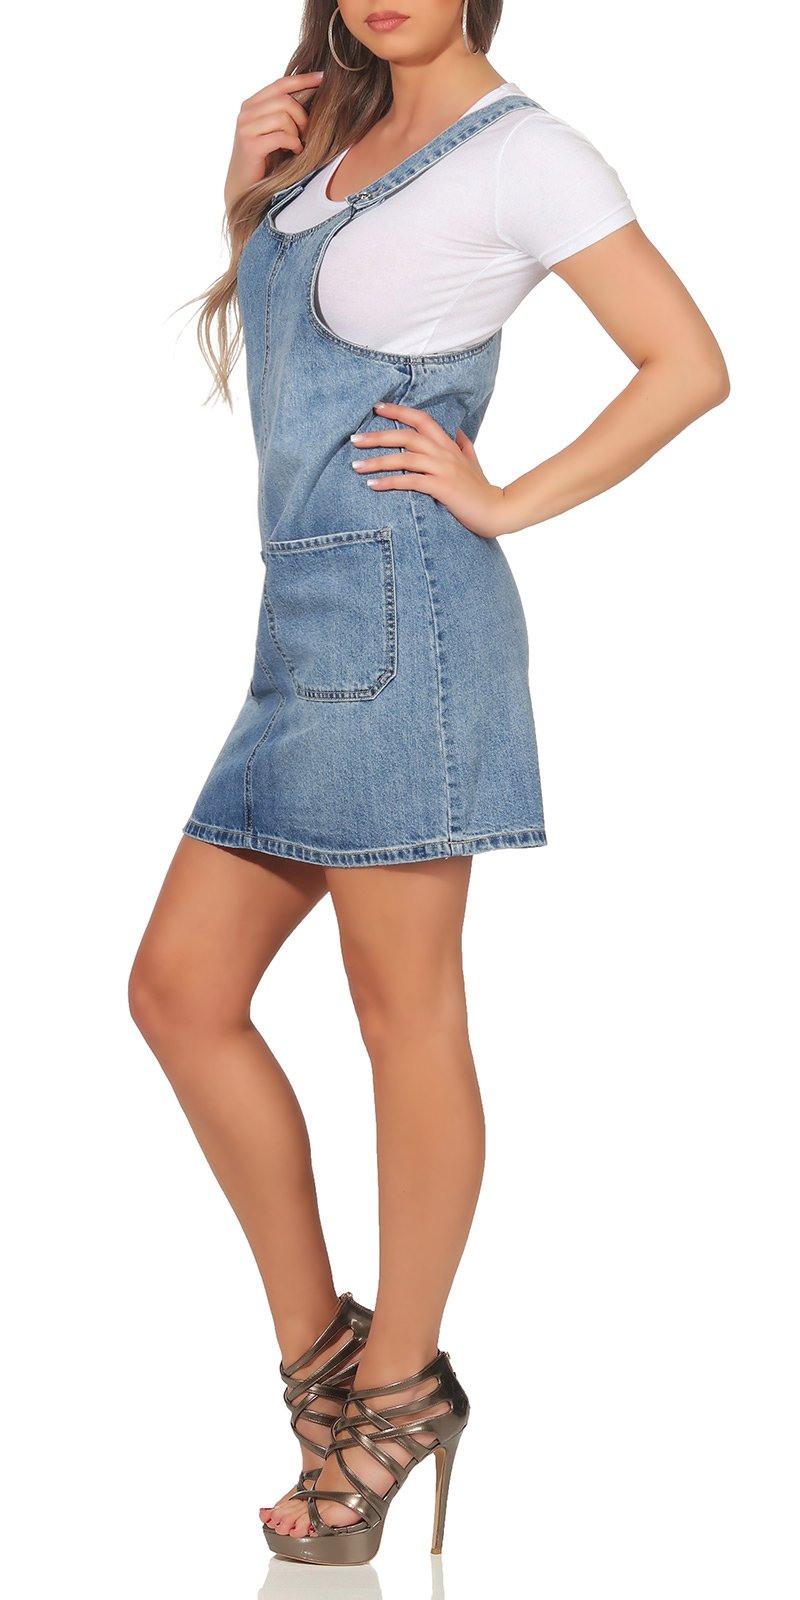 Damen Kleid Jeanskleid Minikleid Latzrock Jeans Minirock